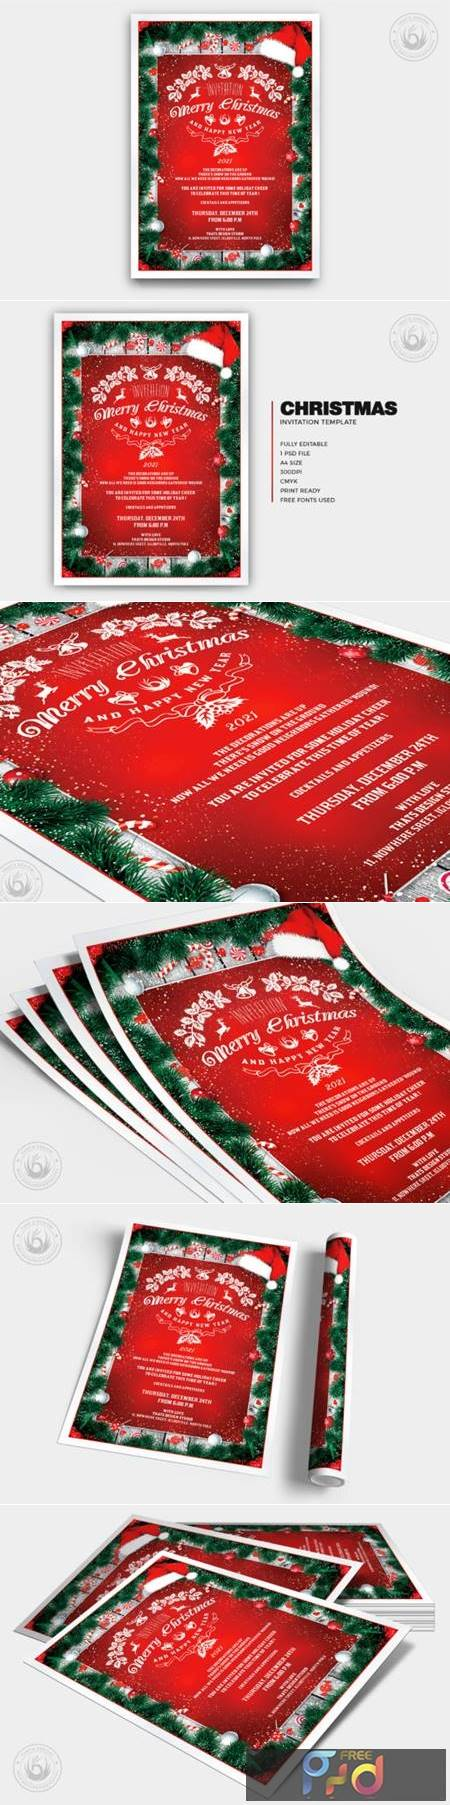 Christmas Invitation Template V6 6918968 1